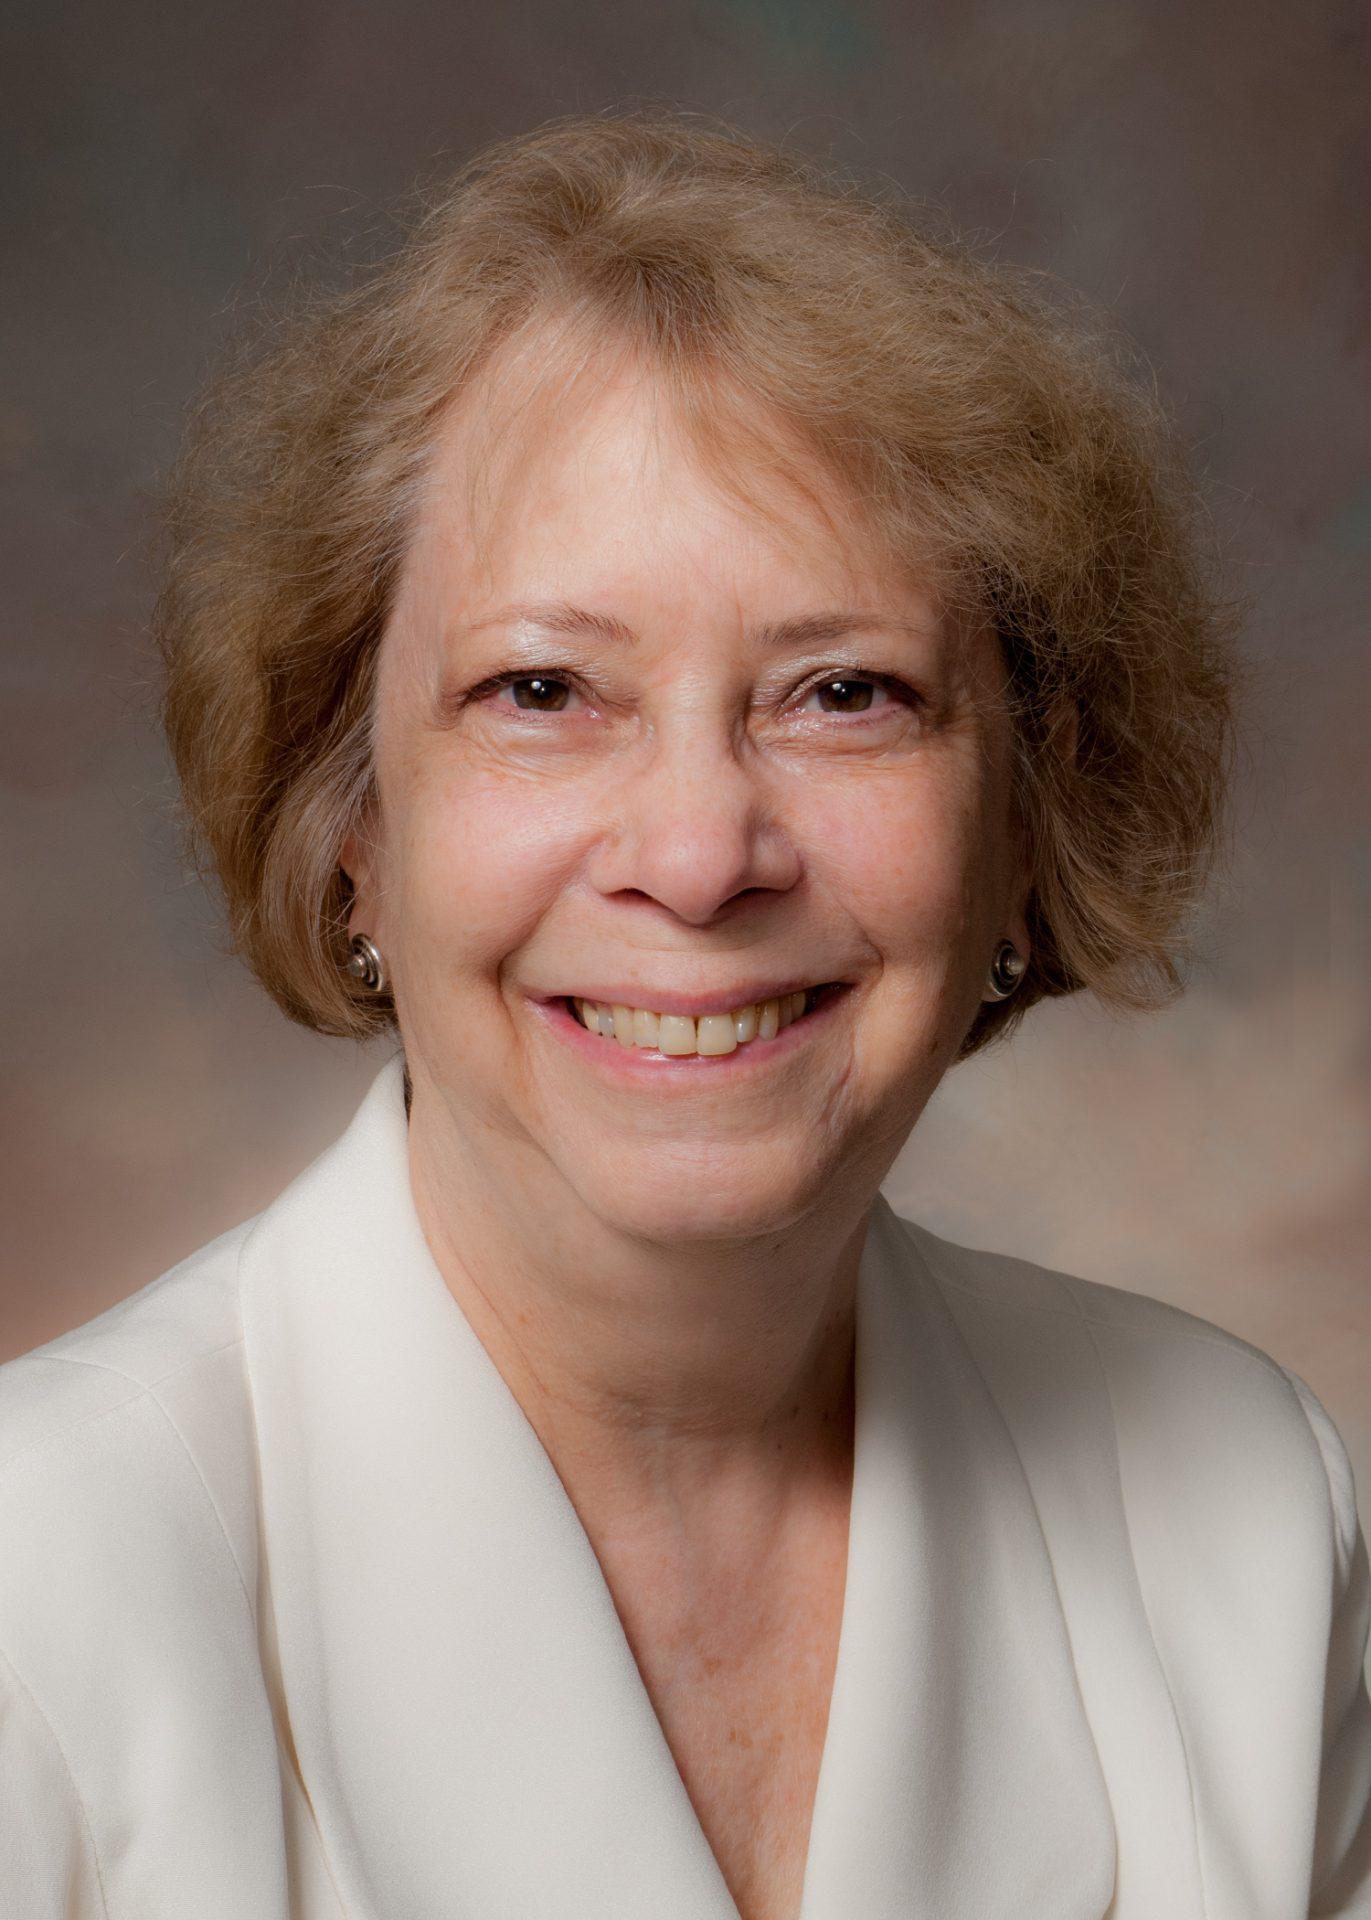 Dr Barbara Barzansky